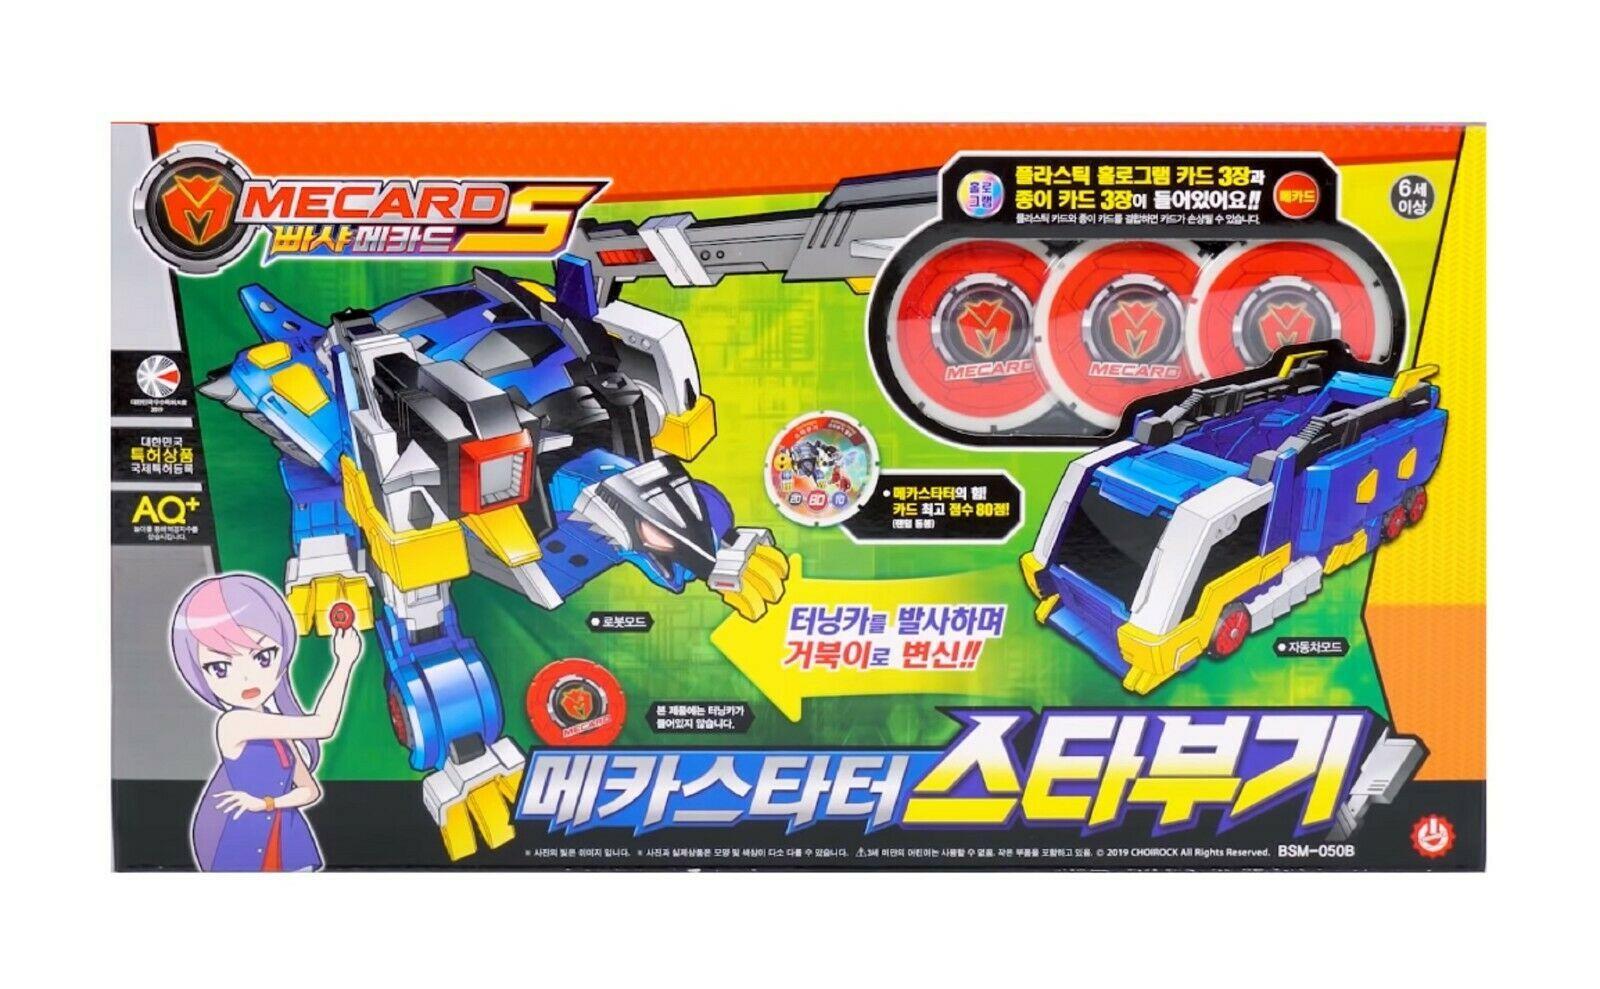 Pasha Mecard Megastarter Star Boogie Transformation Toy Car Action Figure